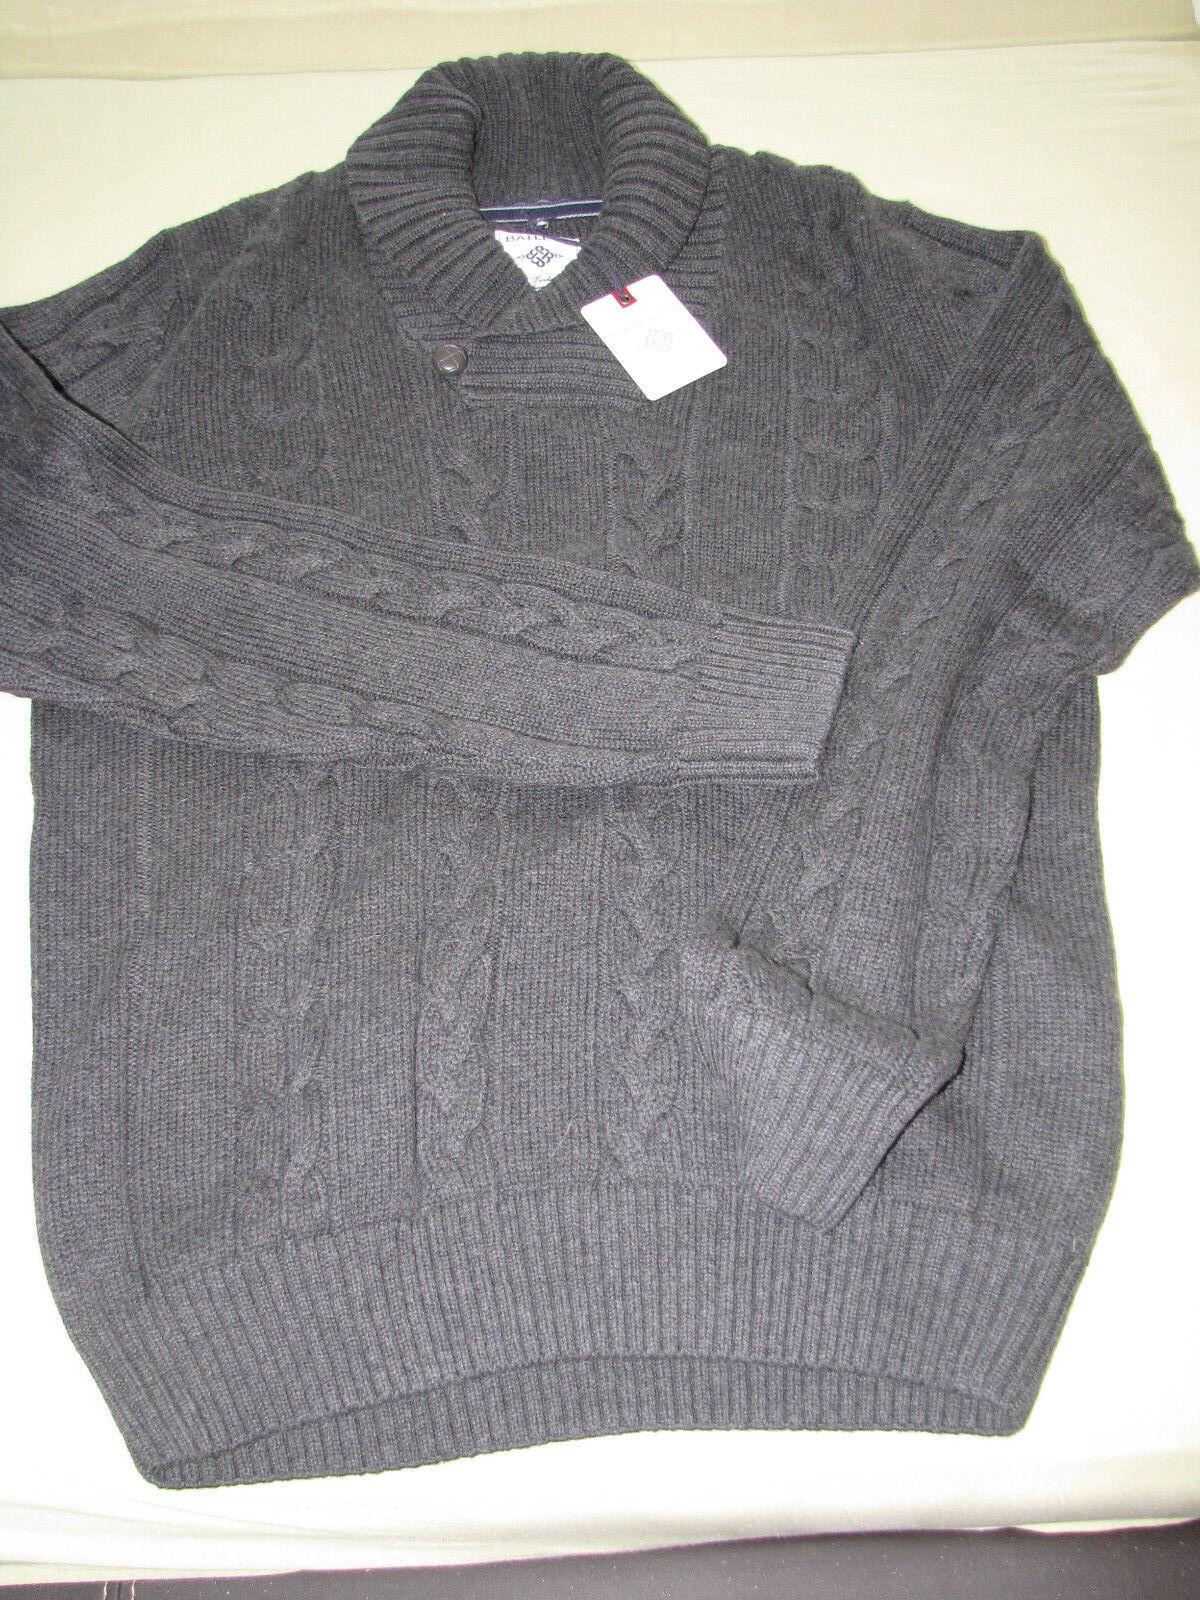 Baileys Herren Pullover Grau  Gr XXL Baumwollmischung